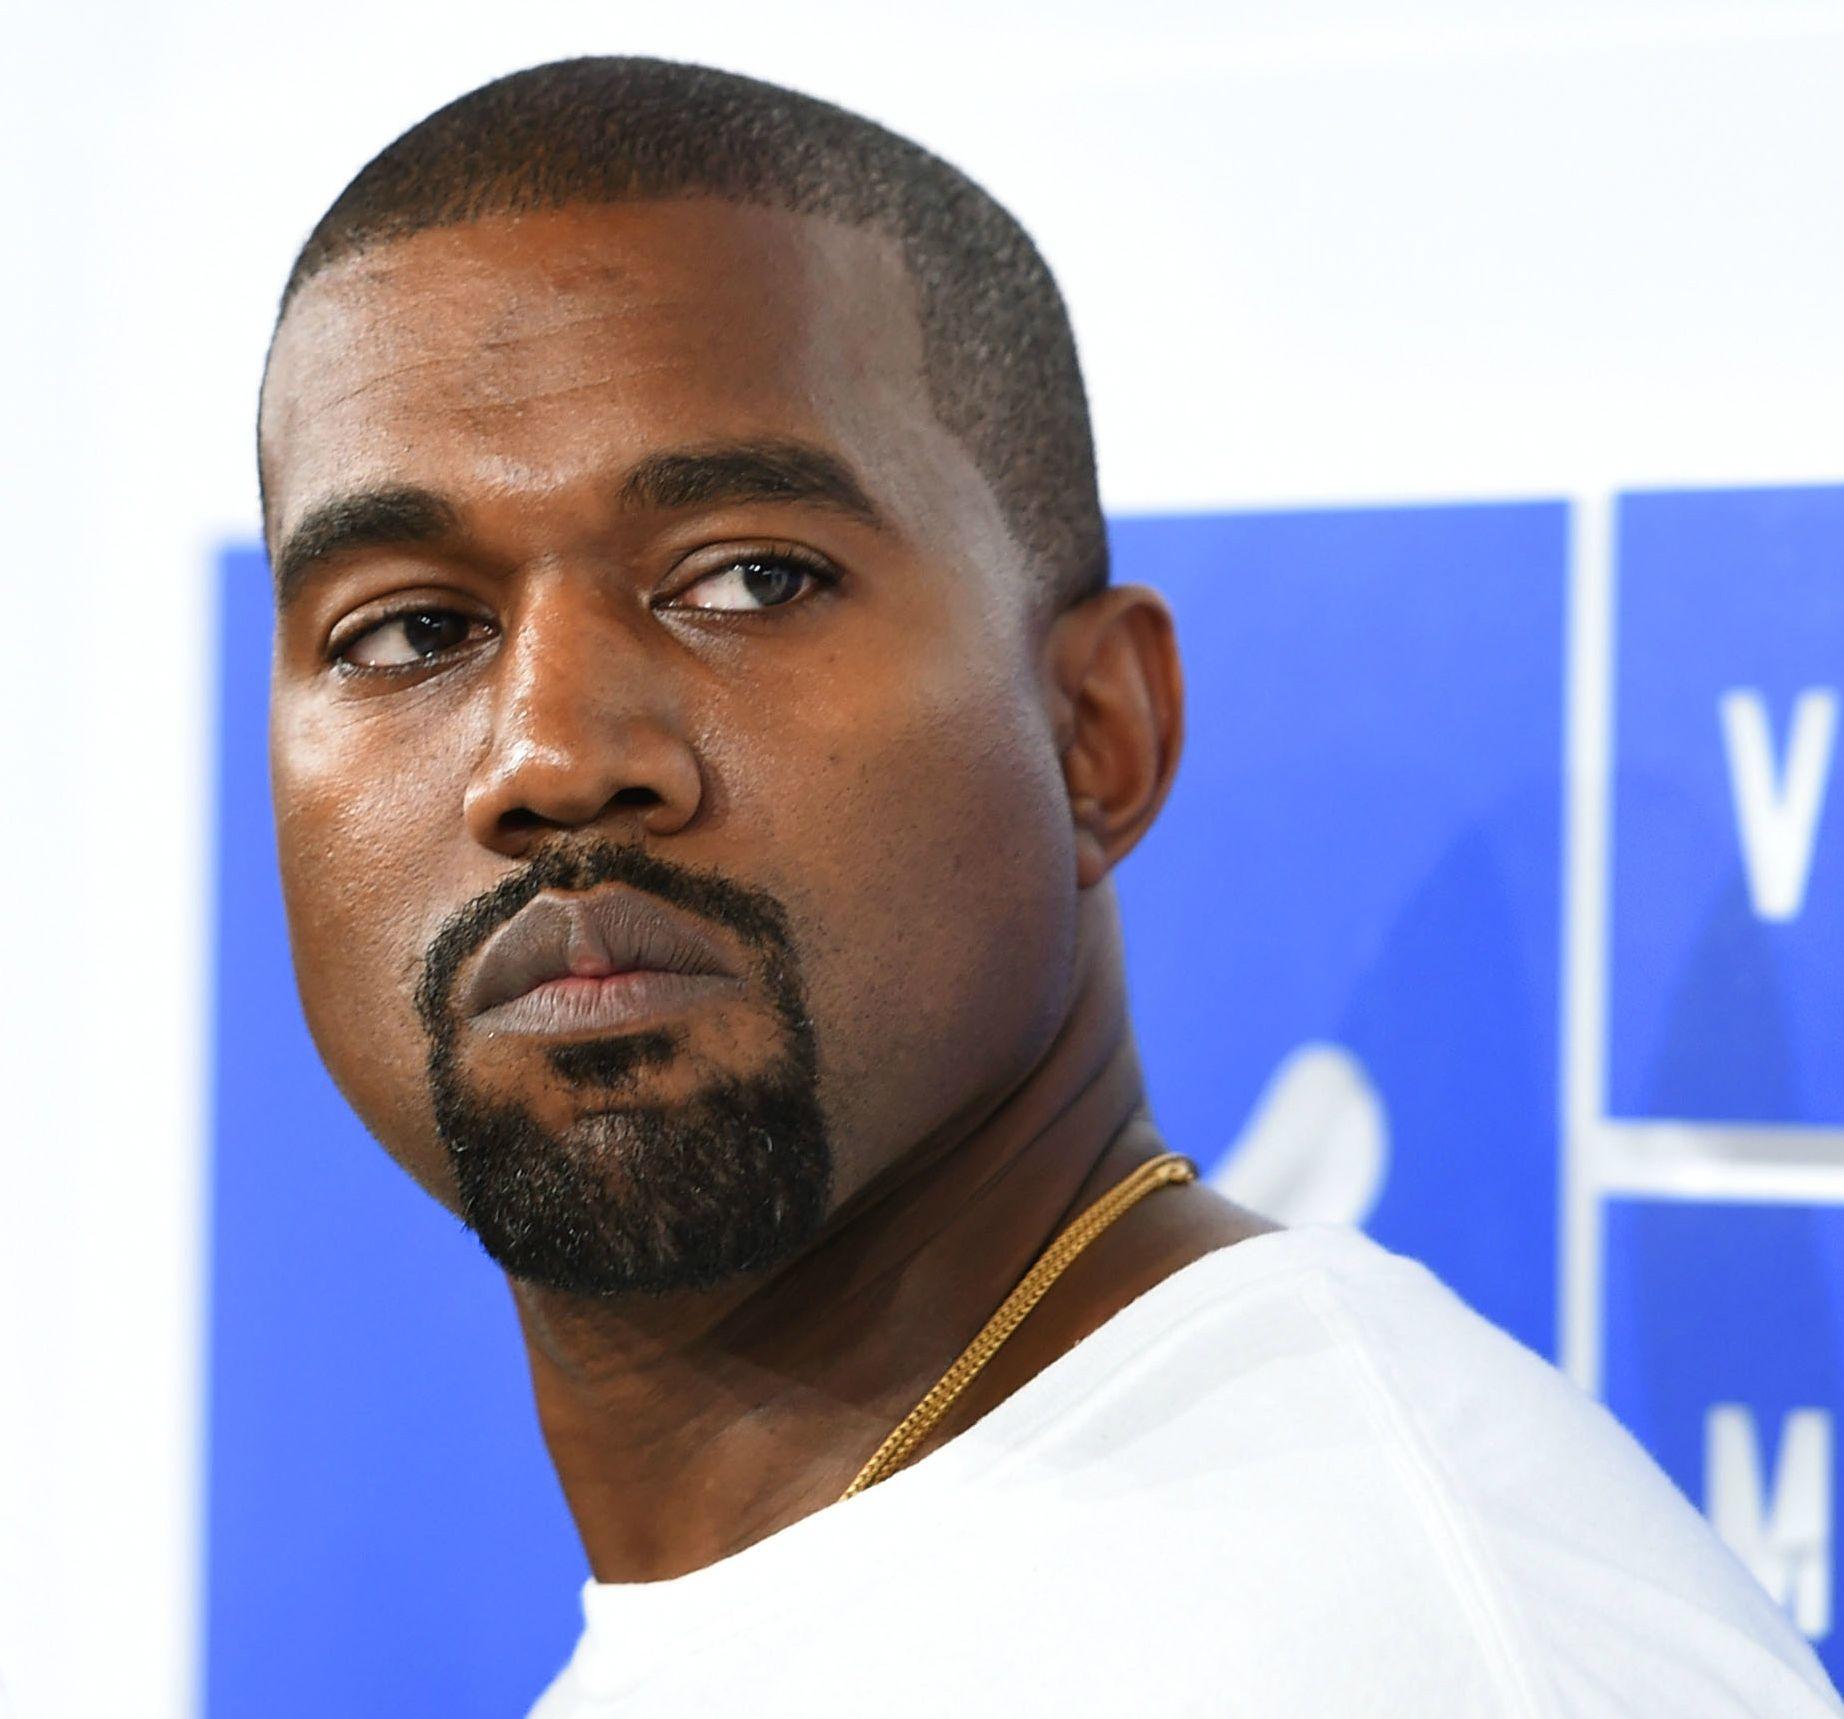 Kanye West Leaves JayZs Tidal Over Money Dispute - Kanye west forgets he is kanye west for a split second